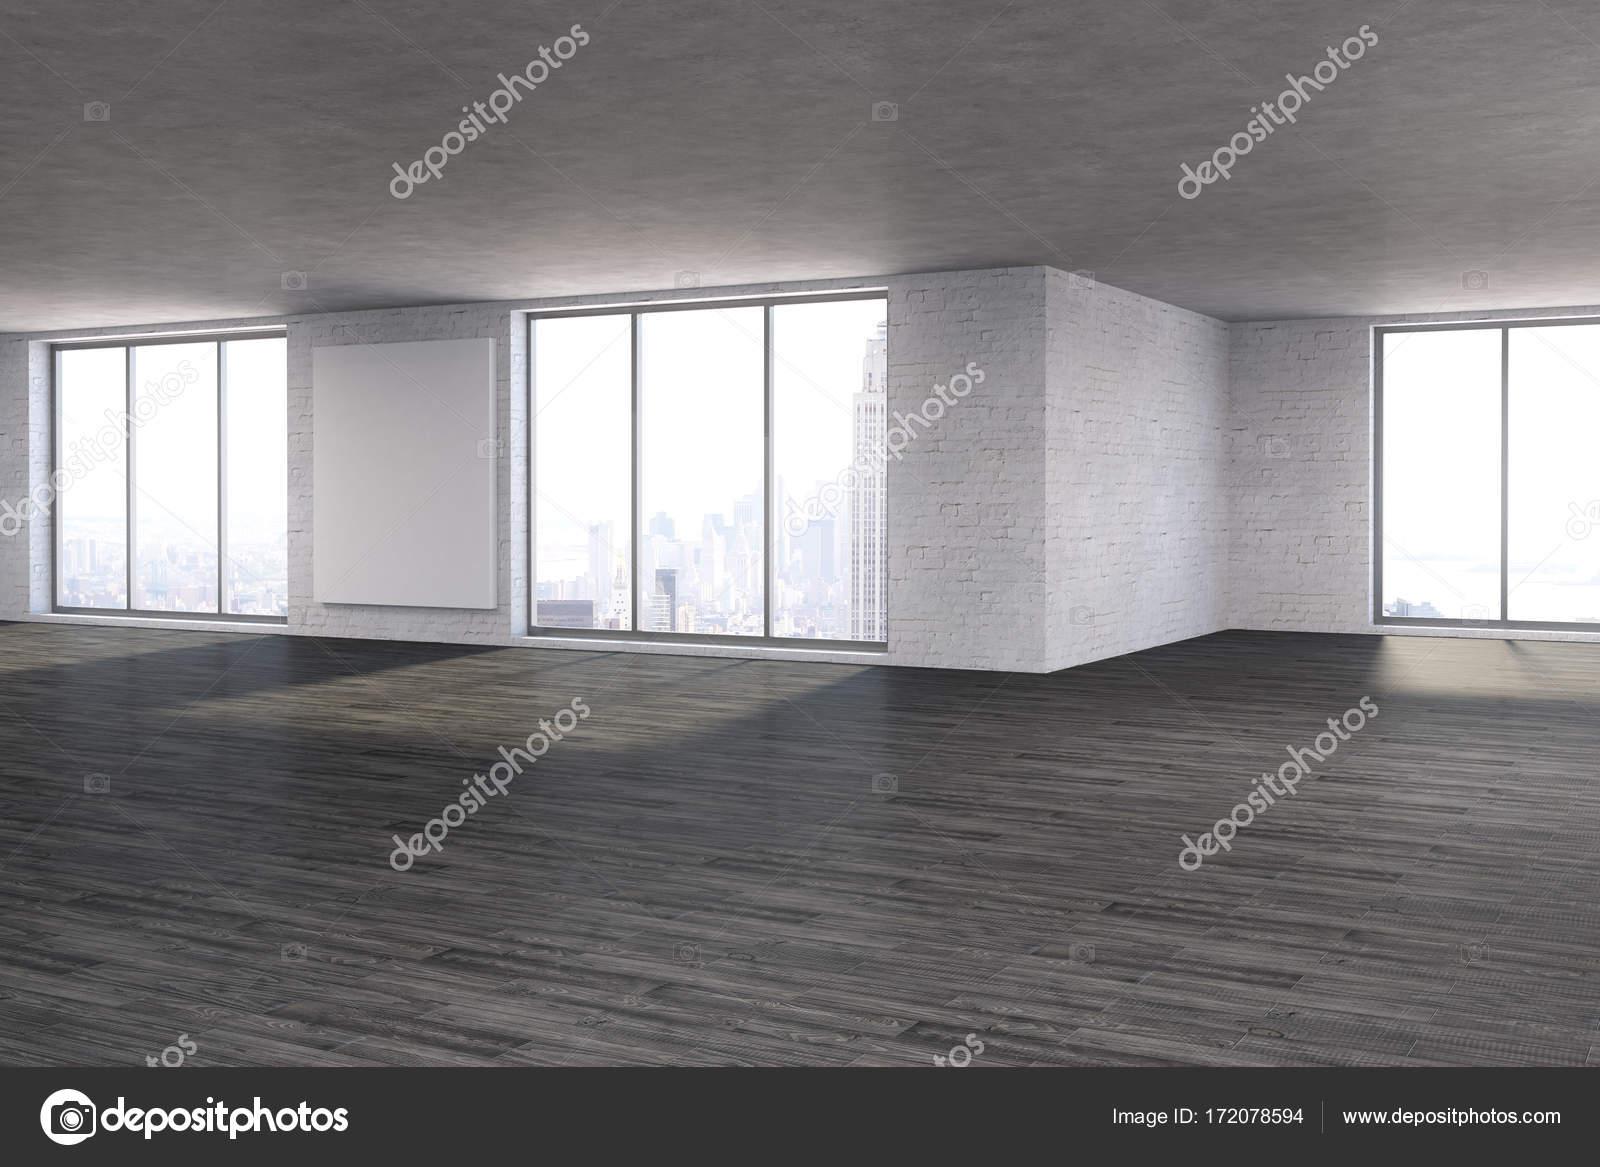 Modernes Zimmer mit leeren Plakat — Stockfoto © peshkova #172078594